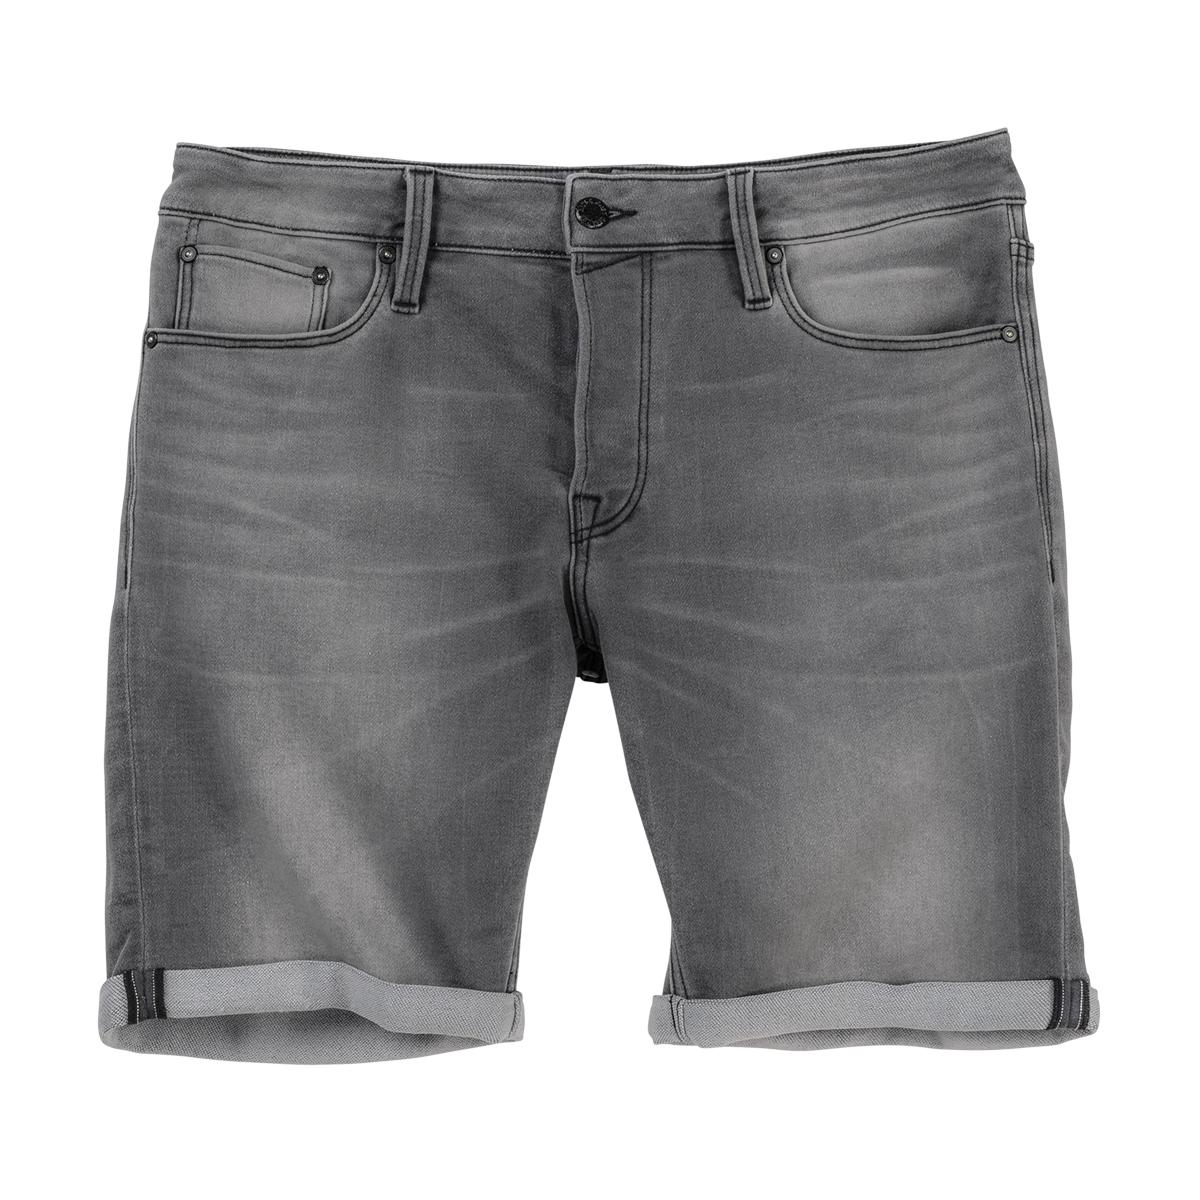 new products e4c20 9ca36 Jack & Jones Stretch-Jeansshorts grau used